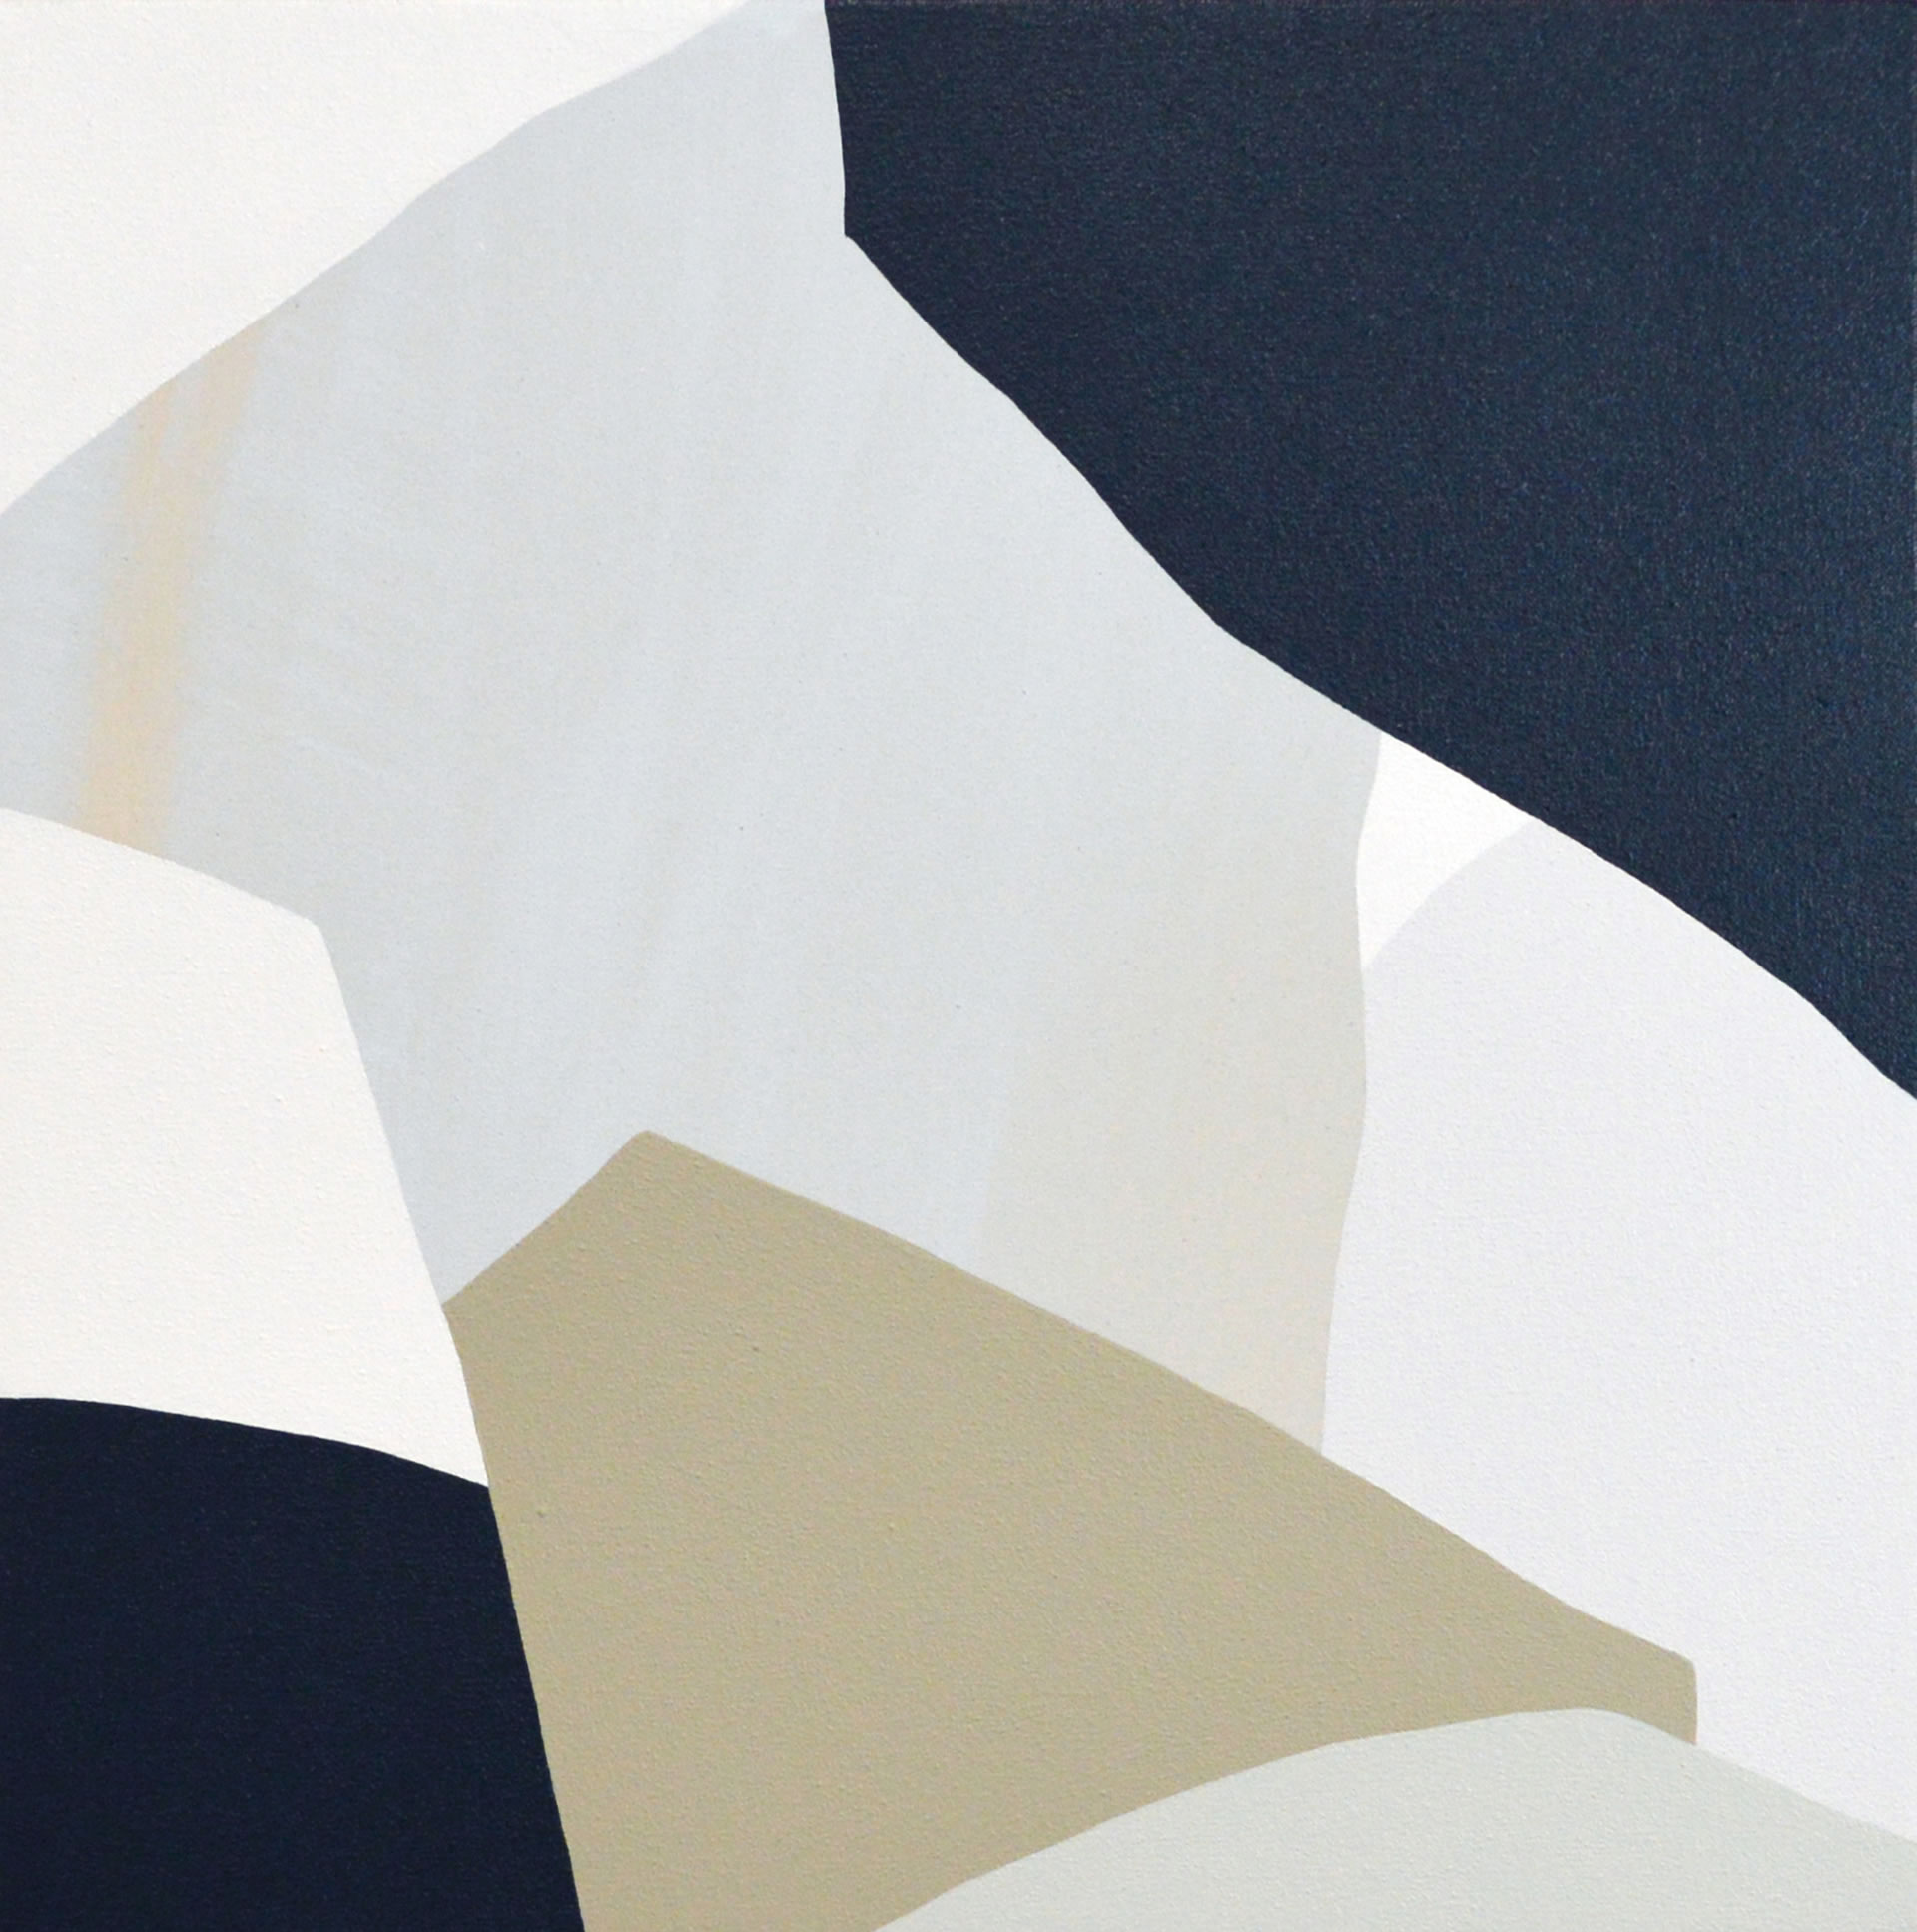 Lesley-Anderson-Secret-Hideaway-16x16-Online-Art-Galleries